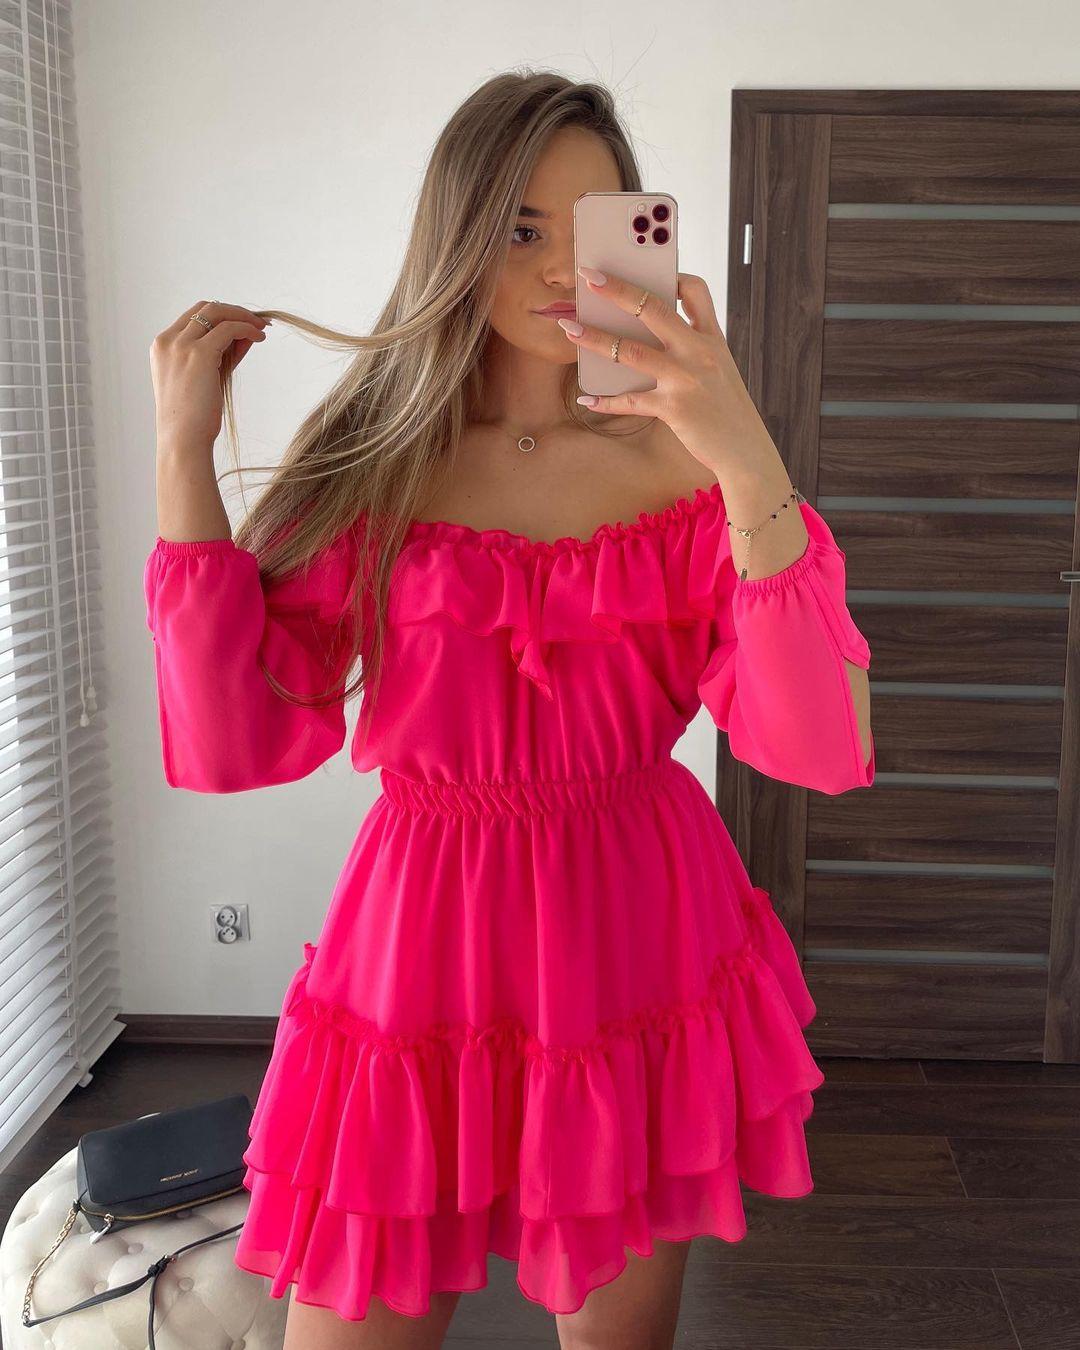 veissey.pl 185557027 476935620206475 4716923982544178809 n 1 Alternatives to the LBD (Little Black Dress)